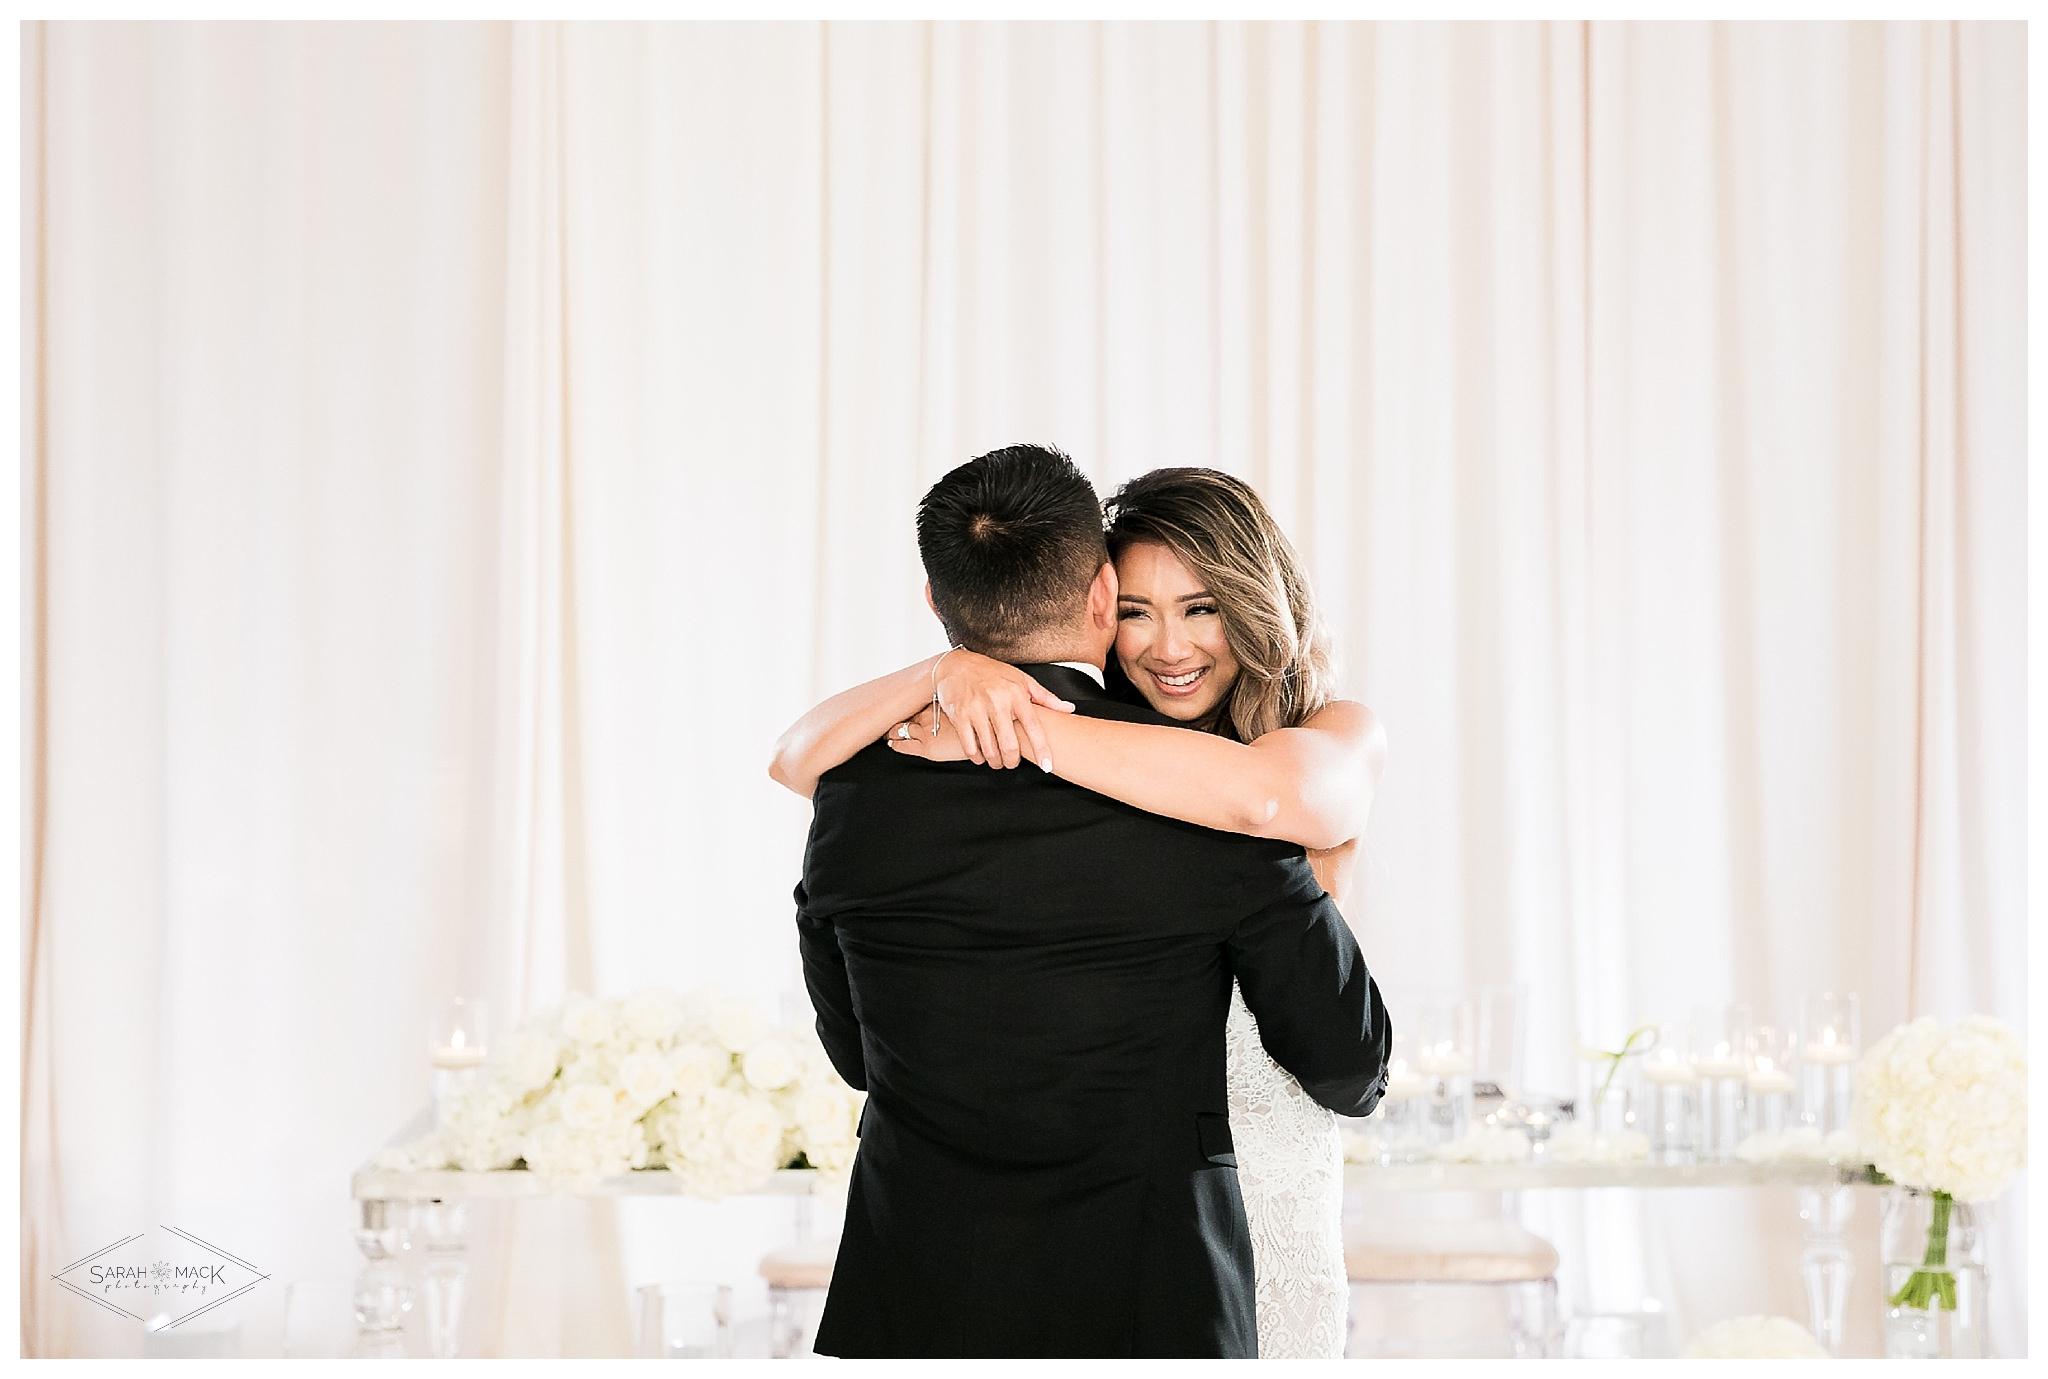 LE-Avenue-of-the-Arts-Costa-Mesa-Wedding-Photography-0188.jpg